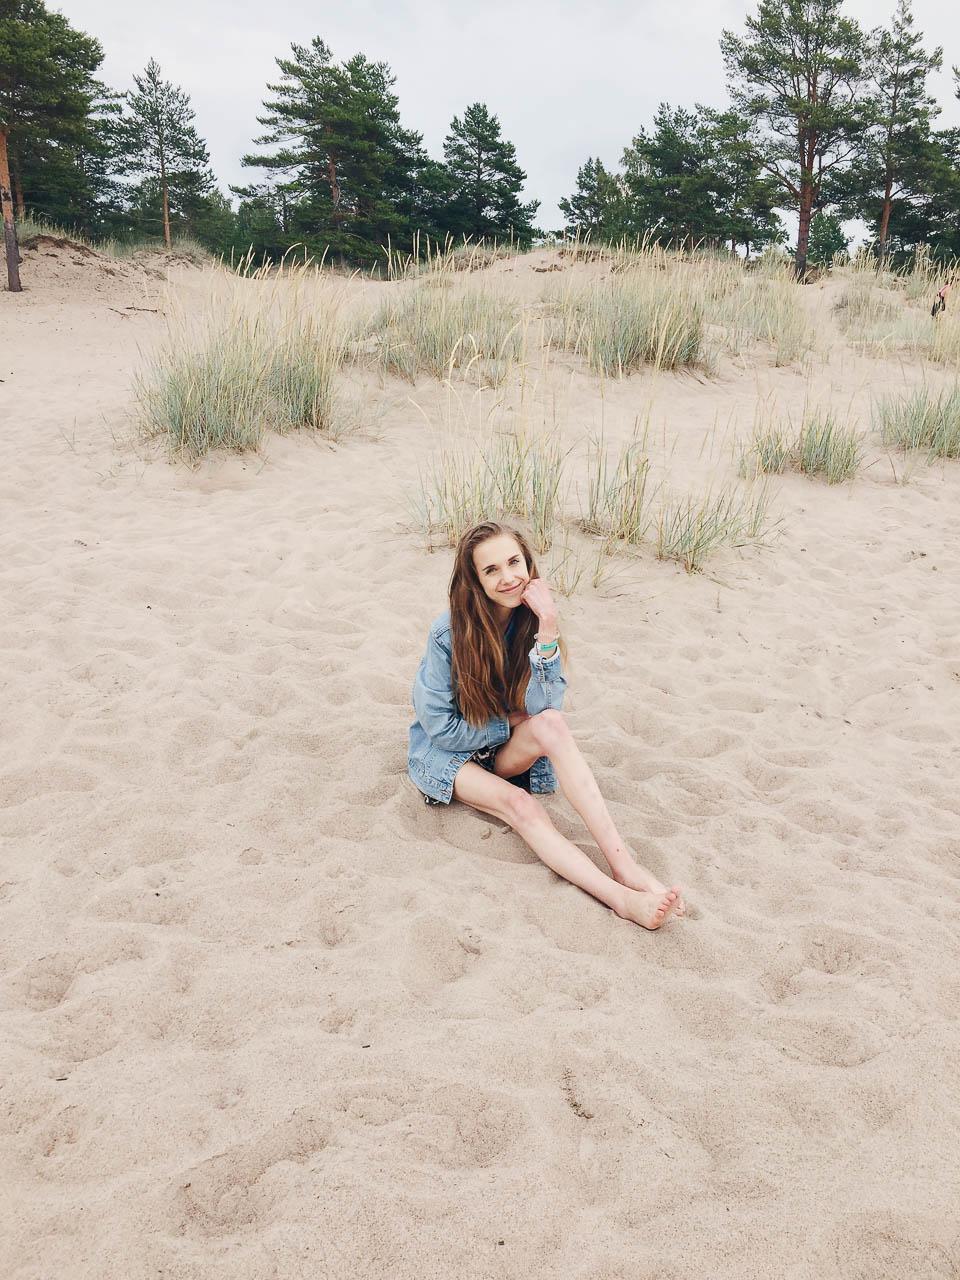 yyteri-beach-pori